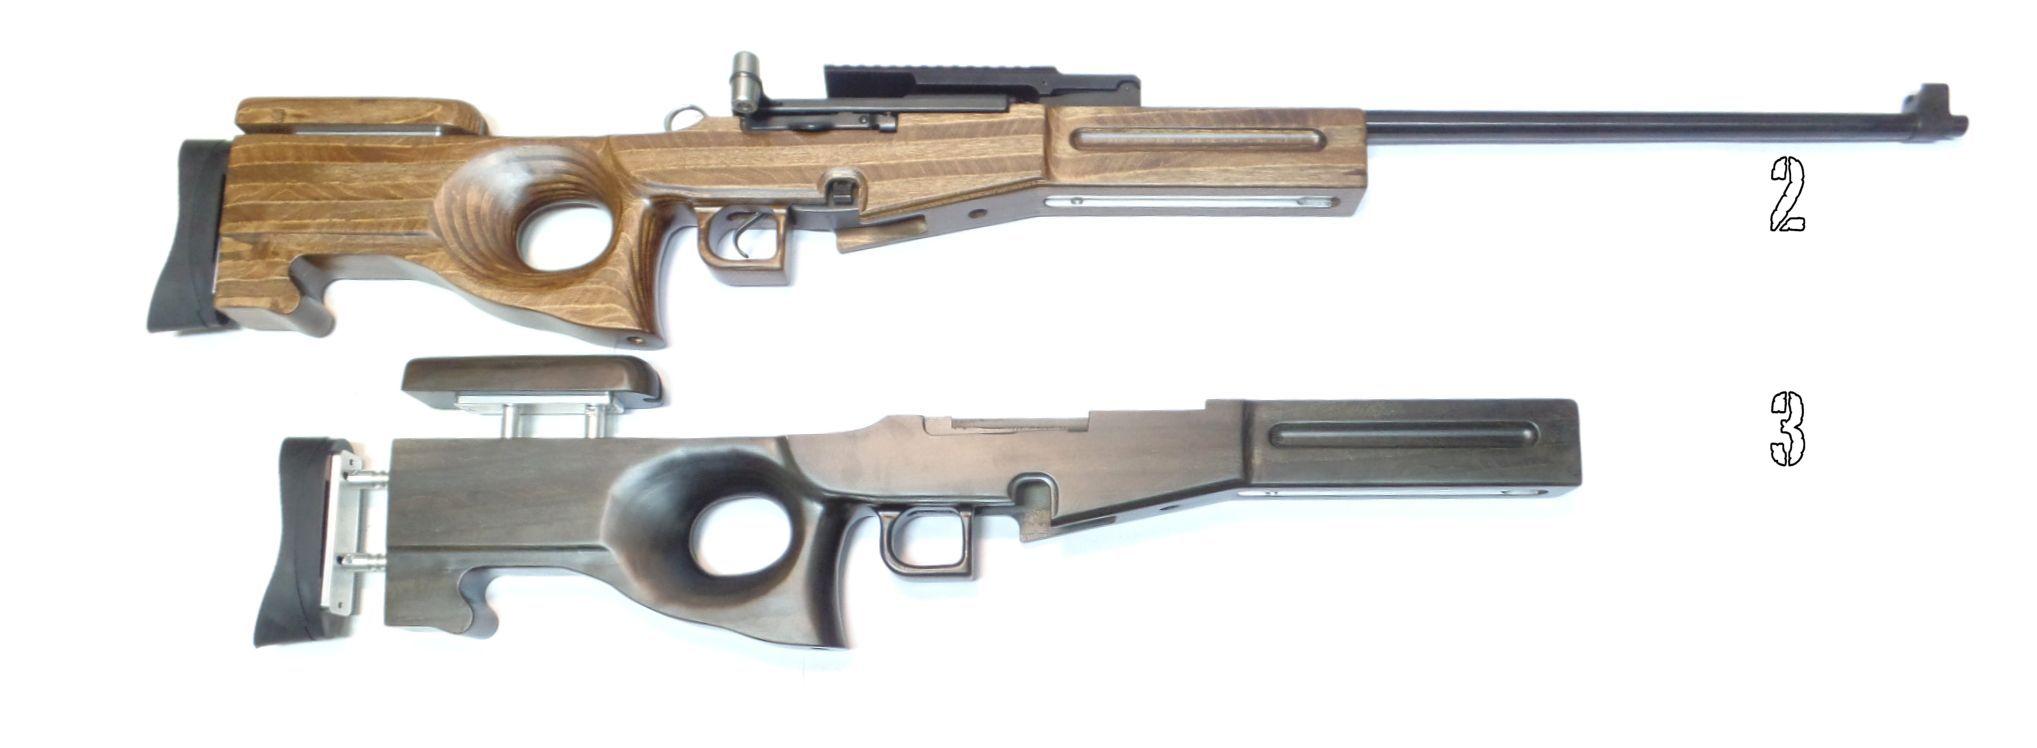 "CROSSE SNIPER K31 ""Tactical"""